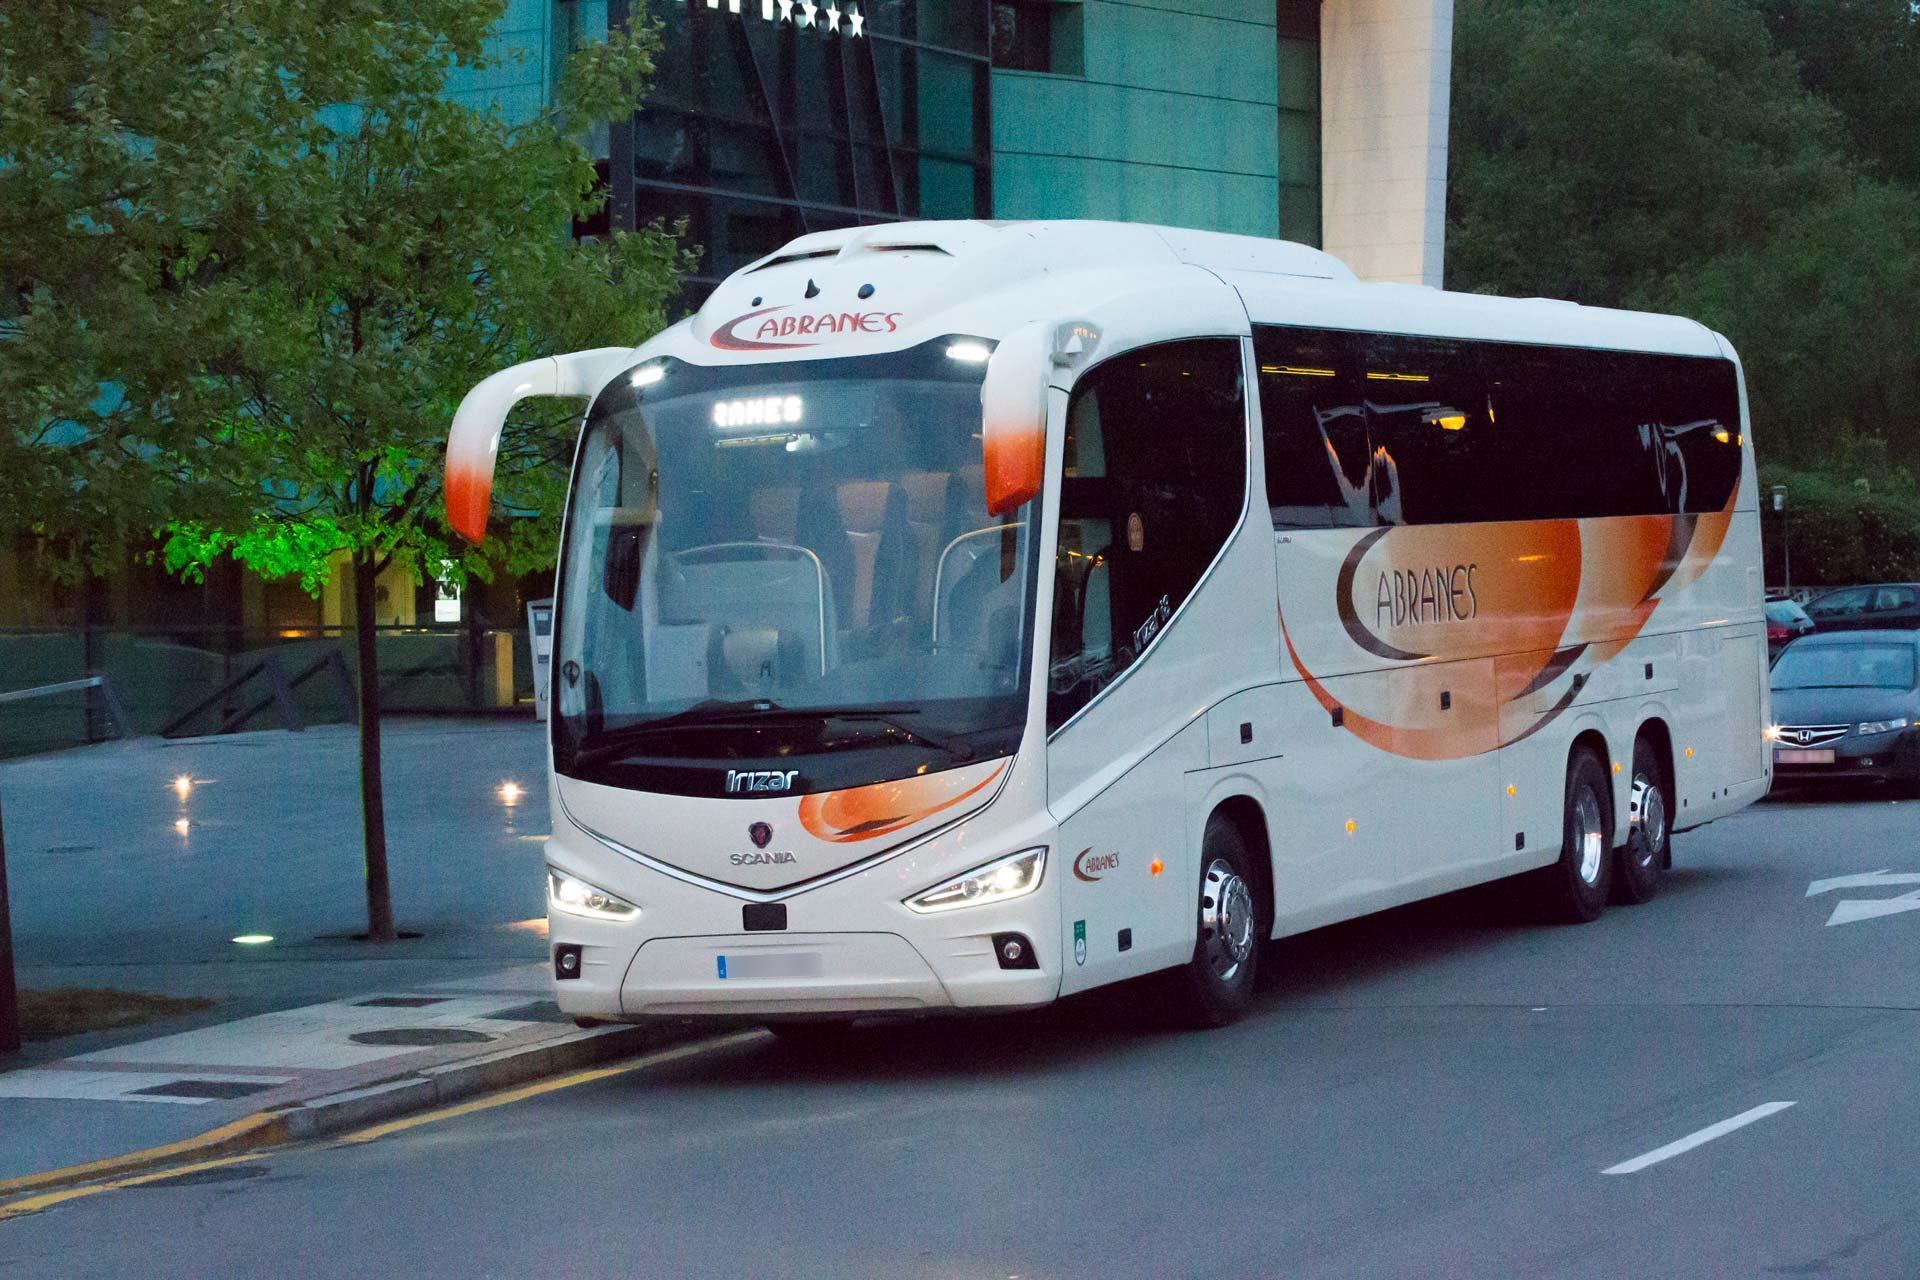 Autocares Cabranes en Gijón